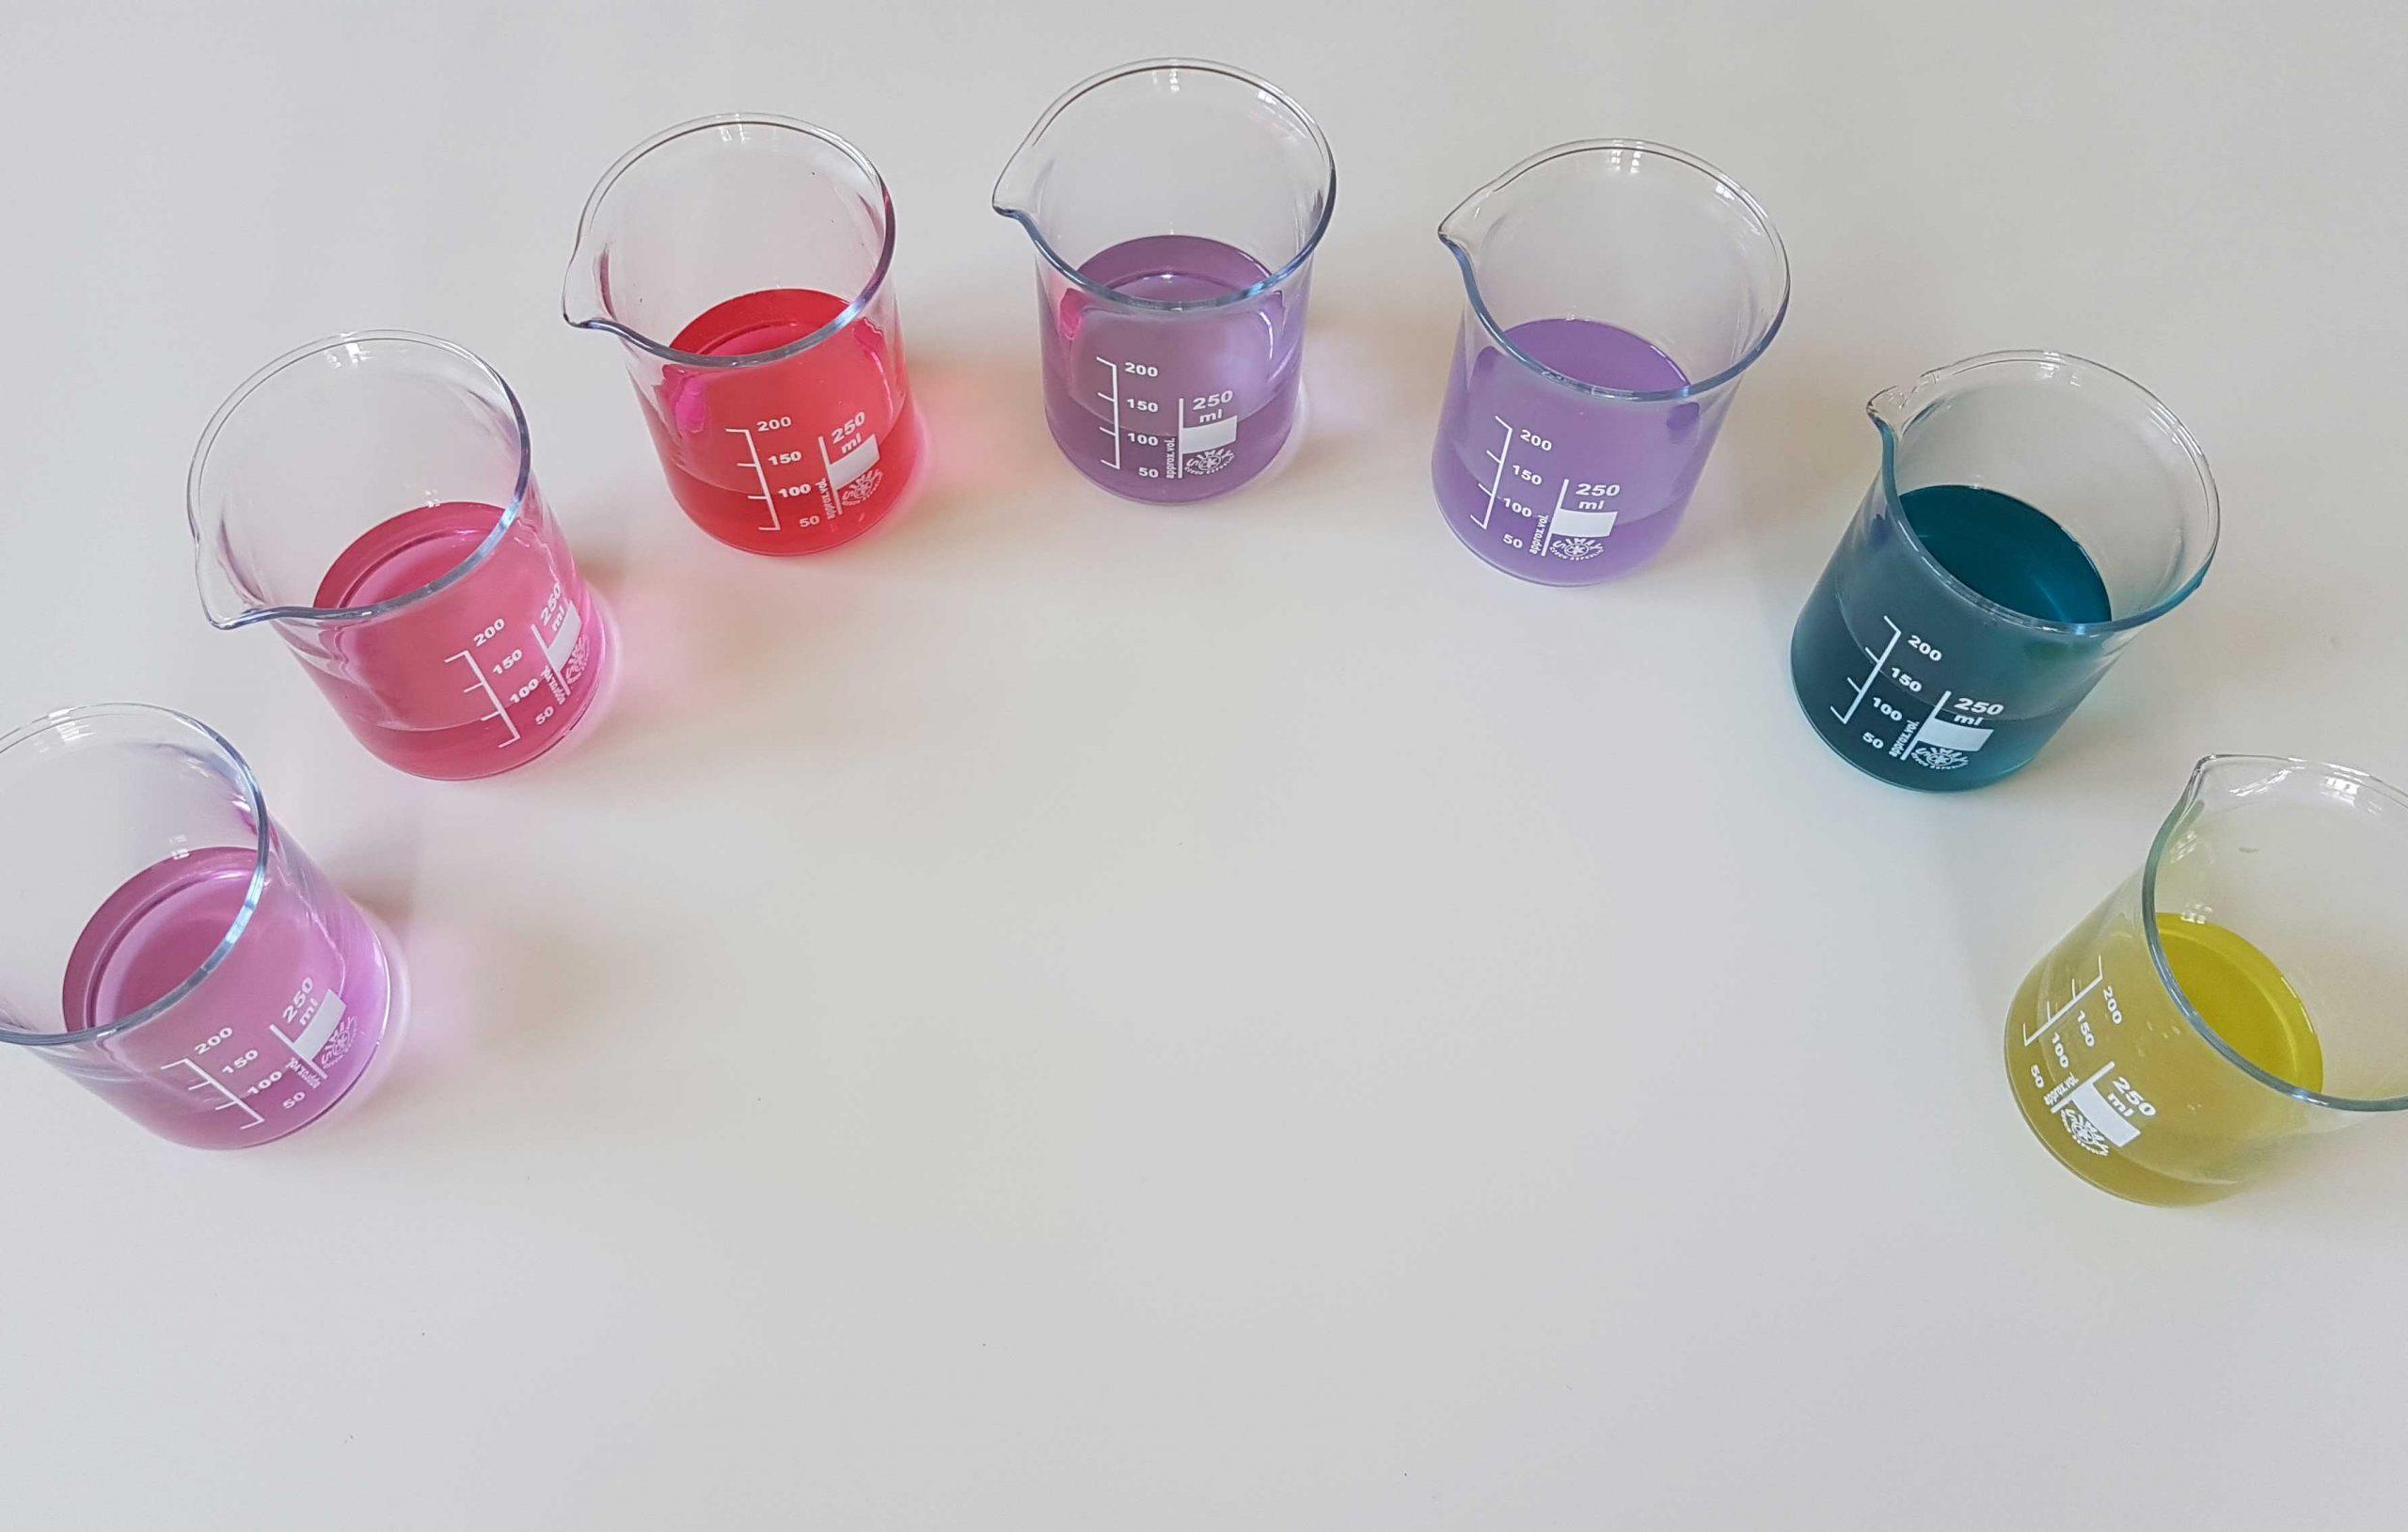 Farbenexperiment mit Rotkrautsaft